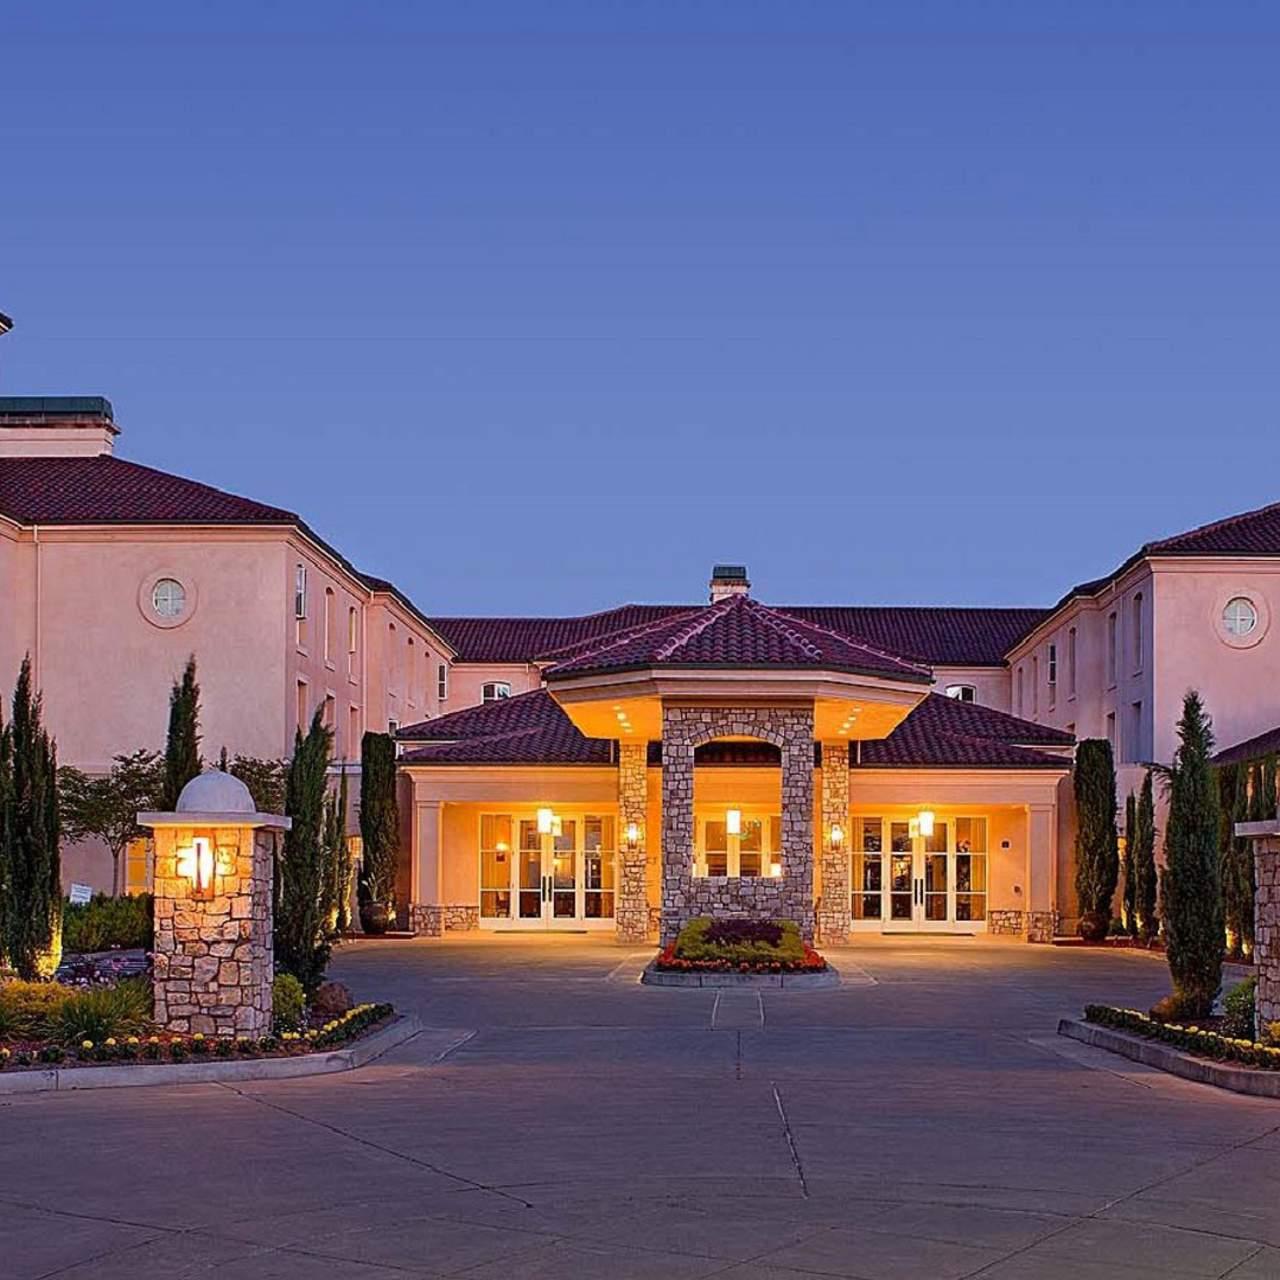 hotel kalifornien hyatt regency sonoma wine country canusa. Black Bedroom Furniture Sets. Home Design Ideas